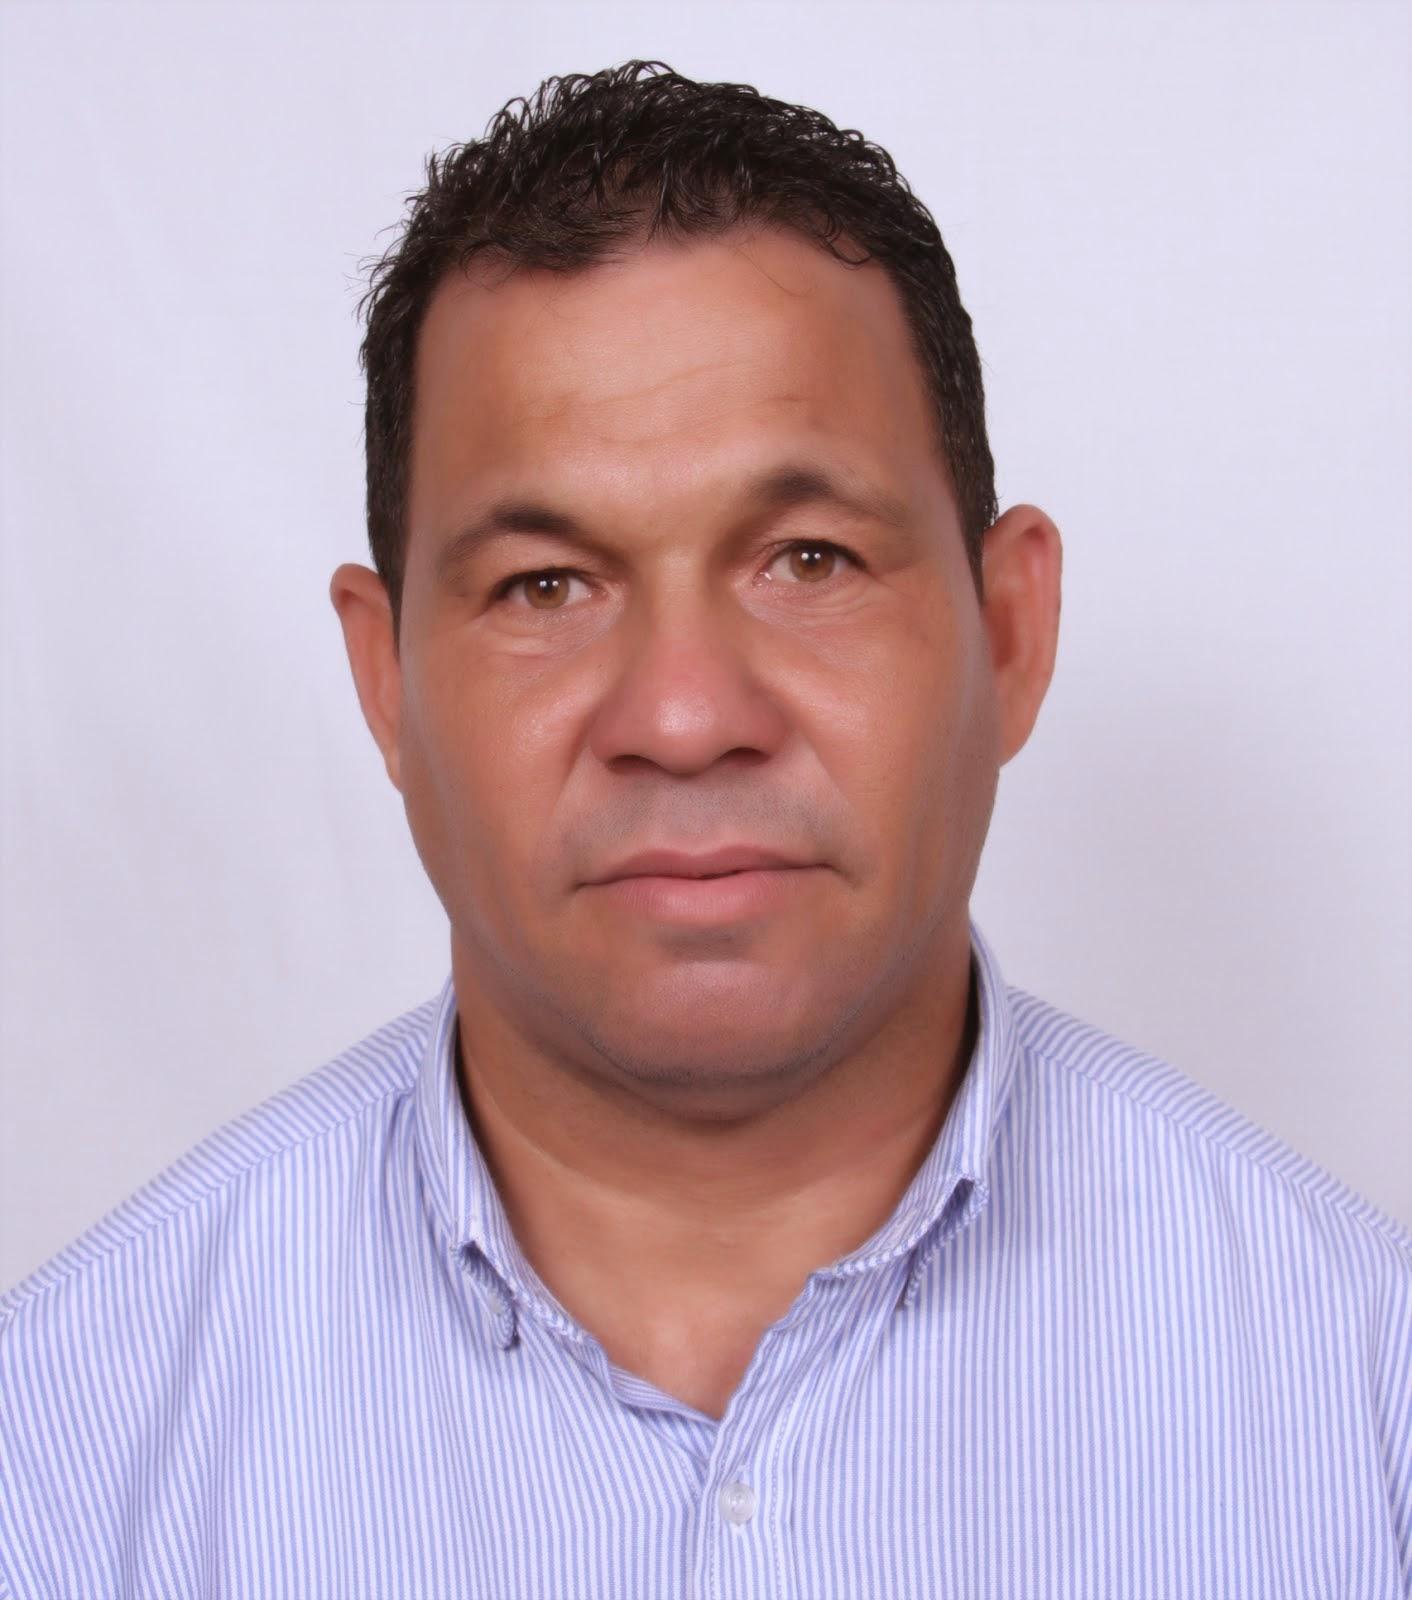 LIC. PEDRO ARROYO RAMOS